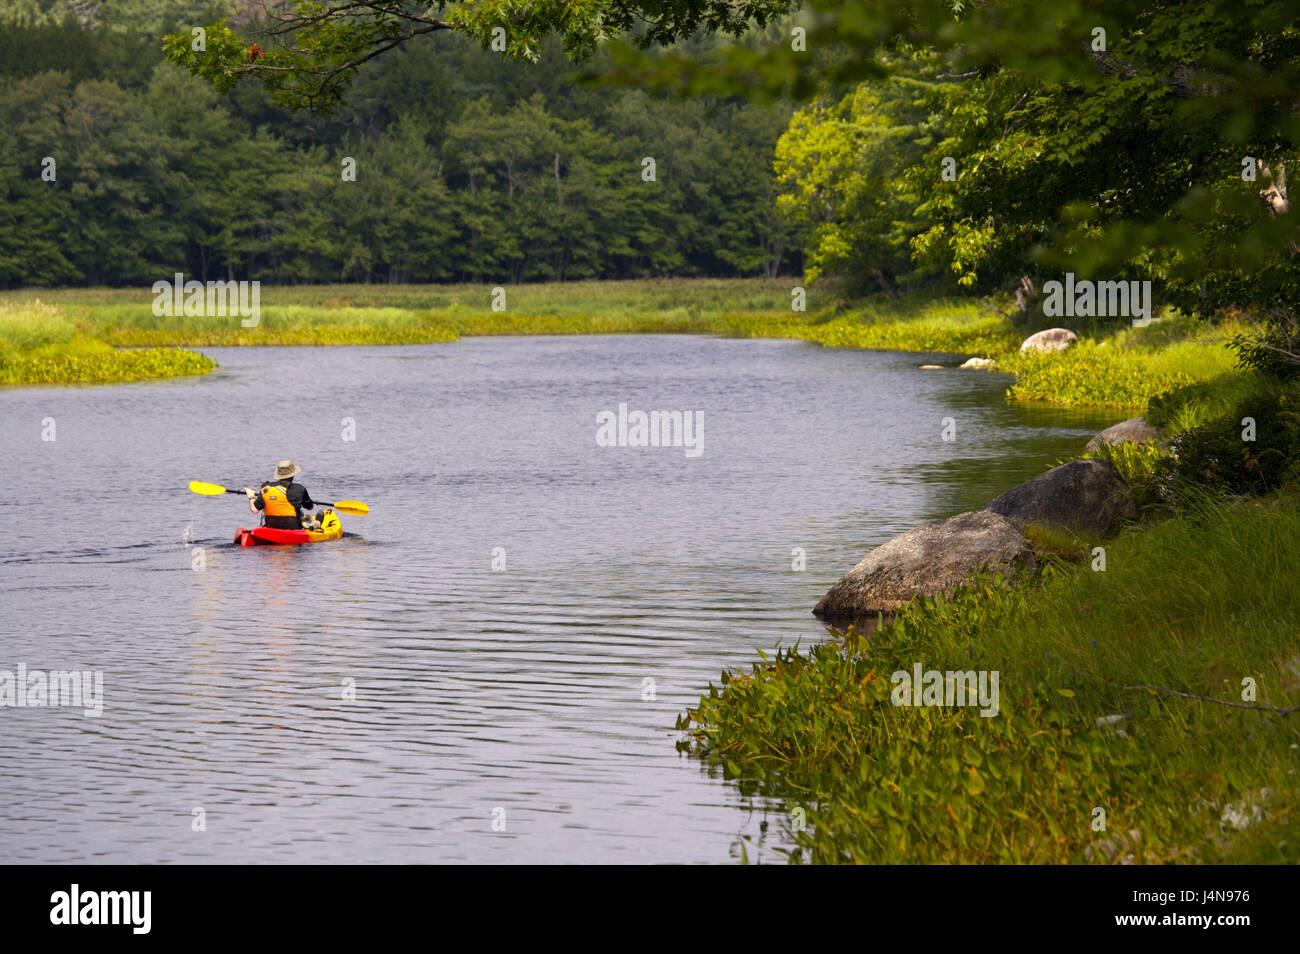 Tourist, Kayak, back view, Mersey River, Kejimkujik Nationwide park, Nova Scotia, Canada, - Stock Image